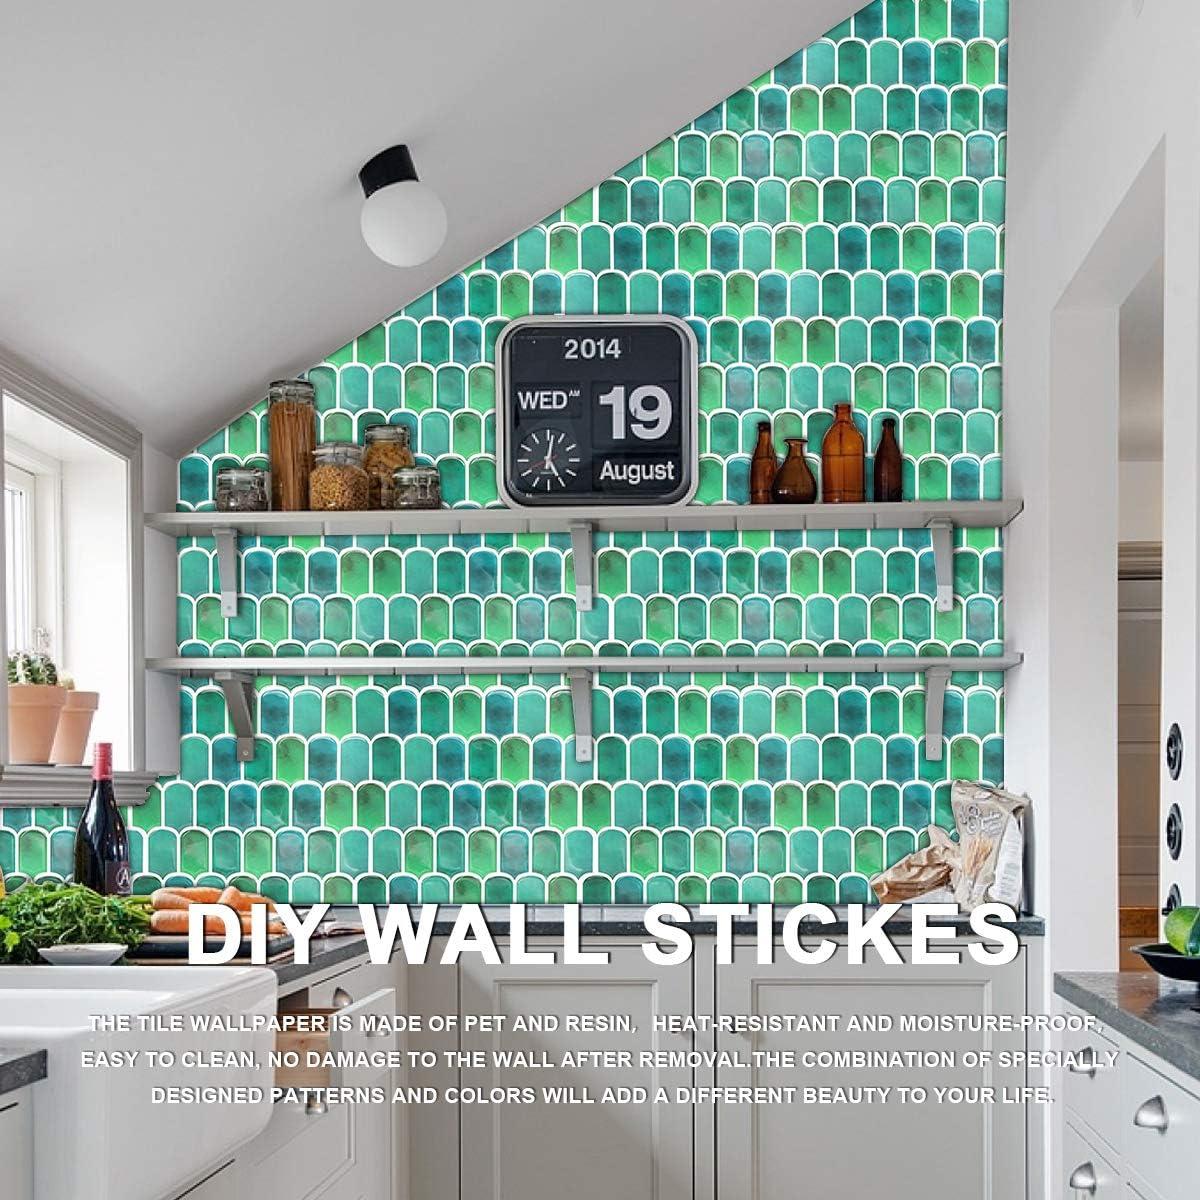 4 Sheets VIVID TREE Purple Tile Peel and Stick Wallpaper 12x12 Self Adhesive Removable Stick on Backsplash Wall Sticker Arch Pattern Wallpaper Tiles for Apartment,Kitchen,Bathroom,RV